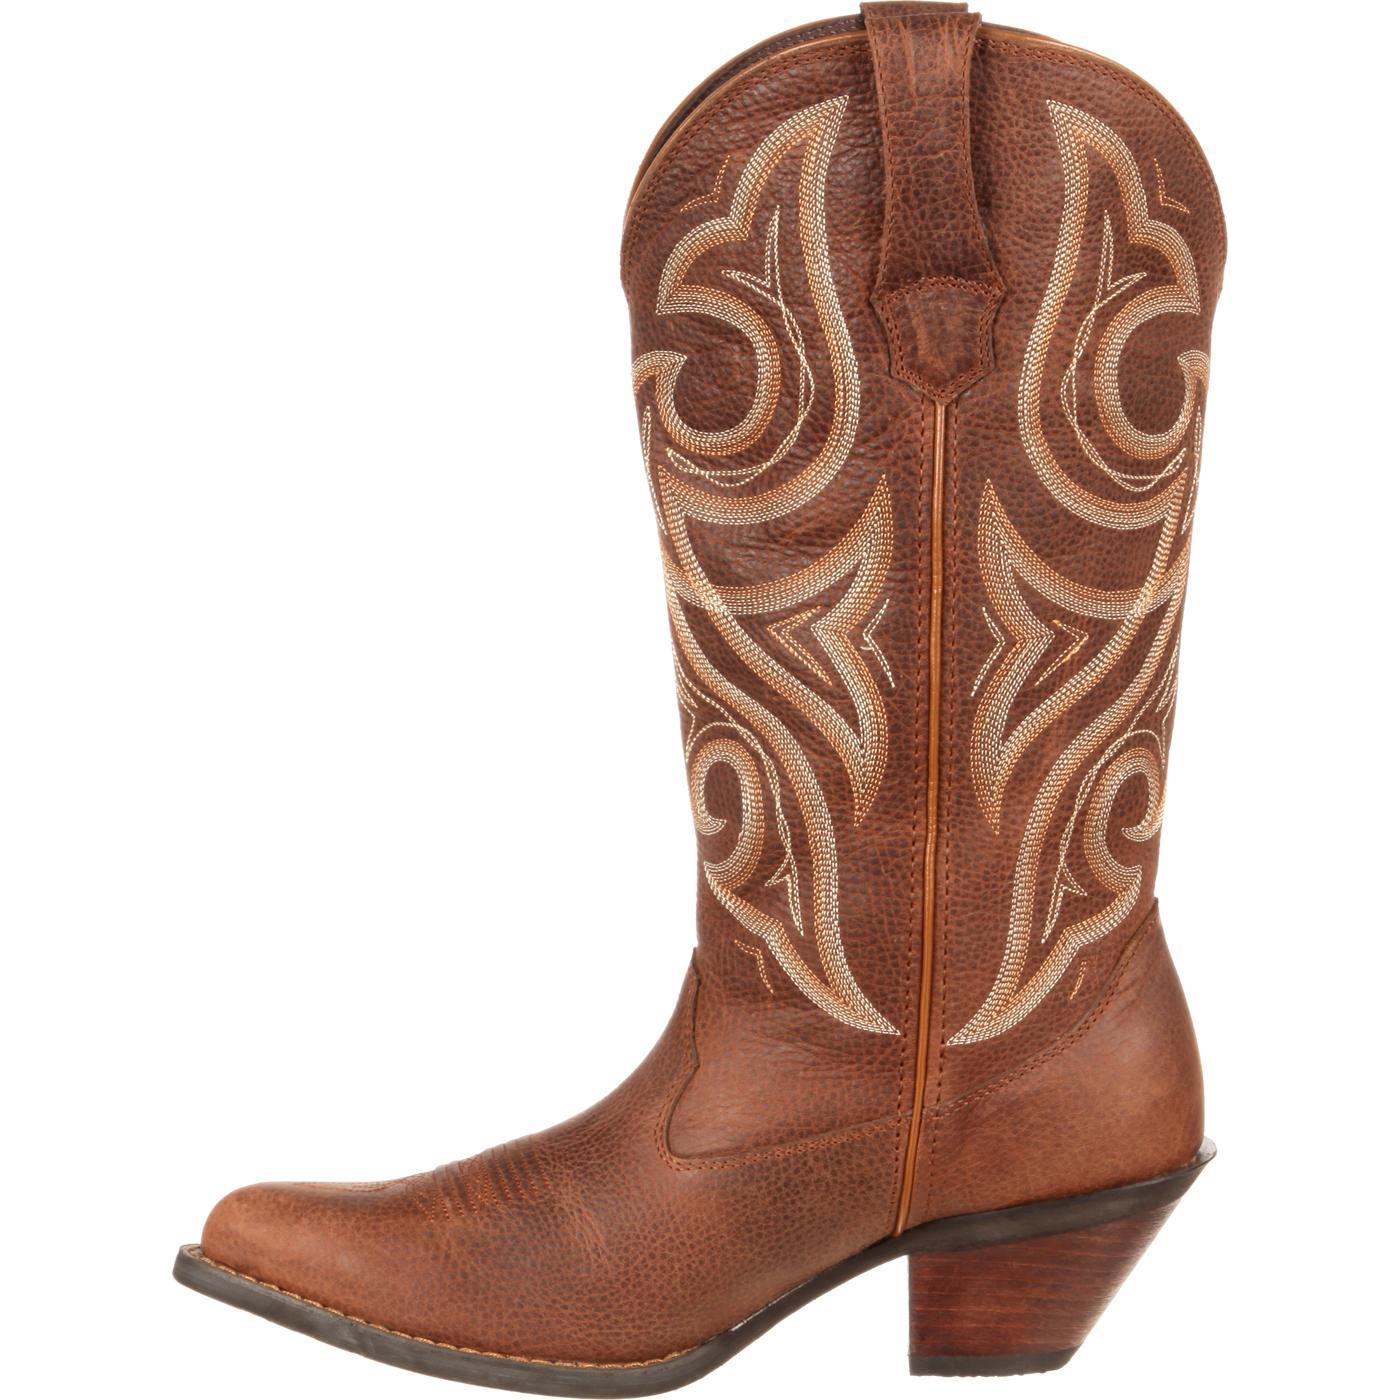 c0d655d4711 Crush by Durango Jealousy Women s Wide Calf Western Boot